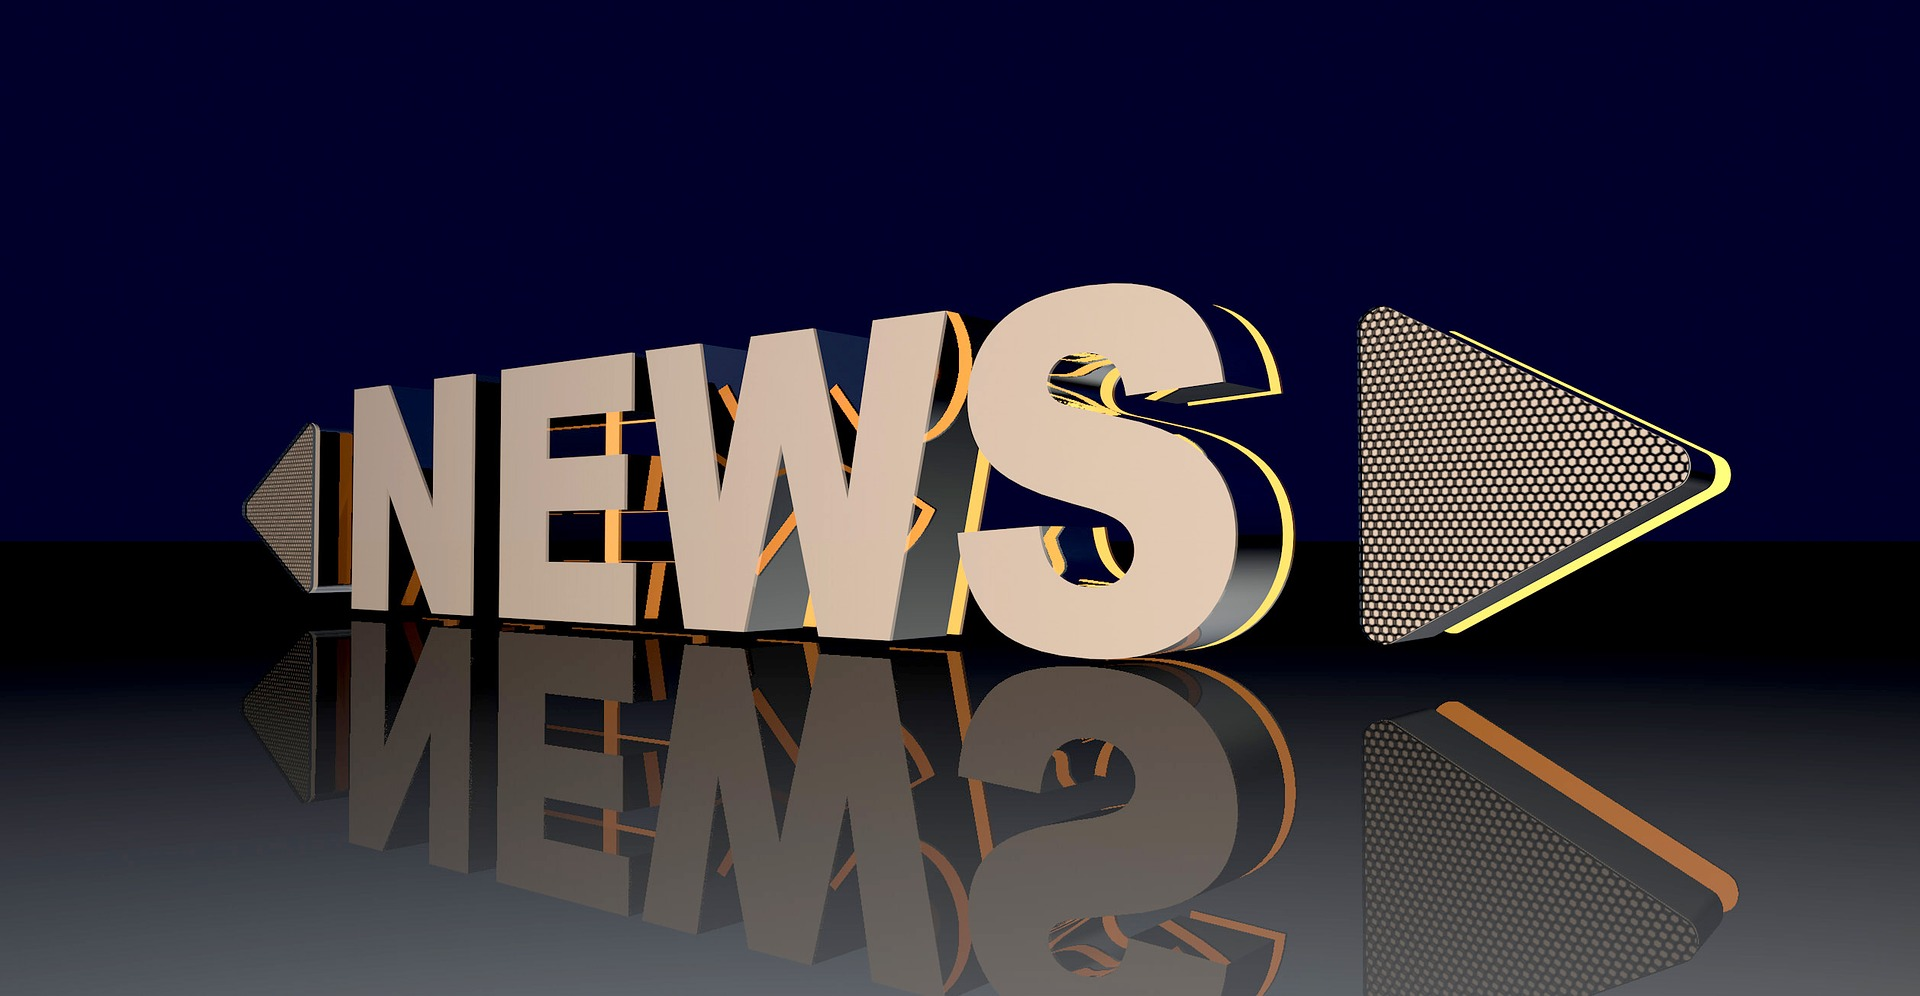 news-1648518_1920.jpg